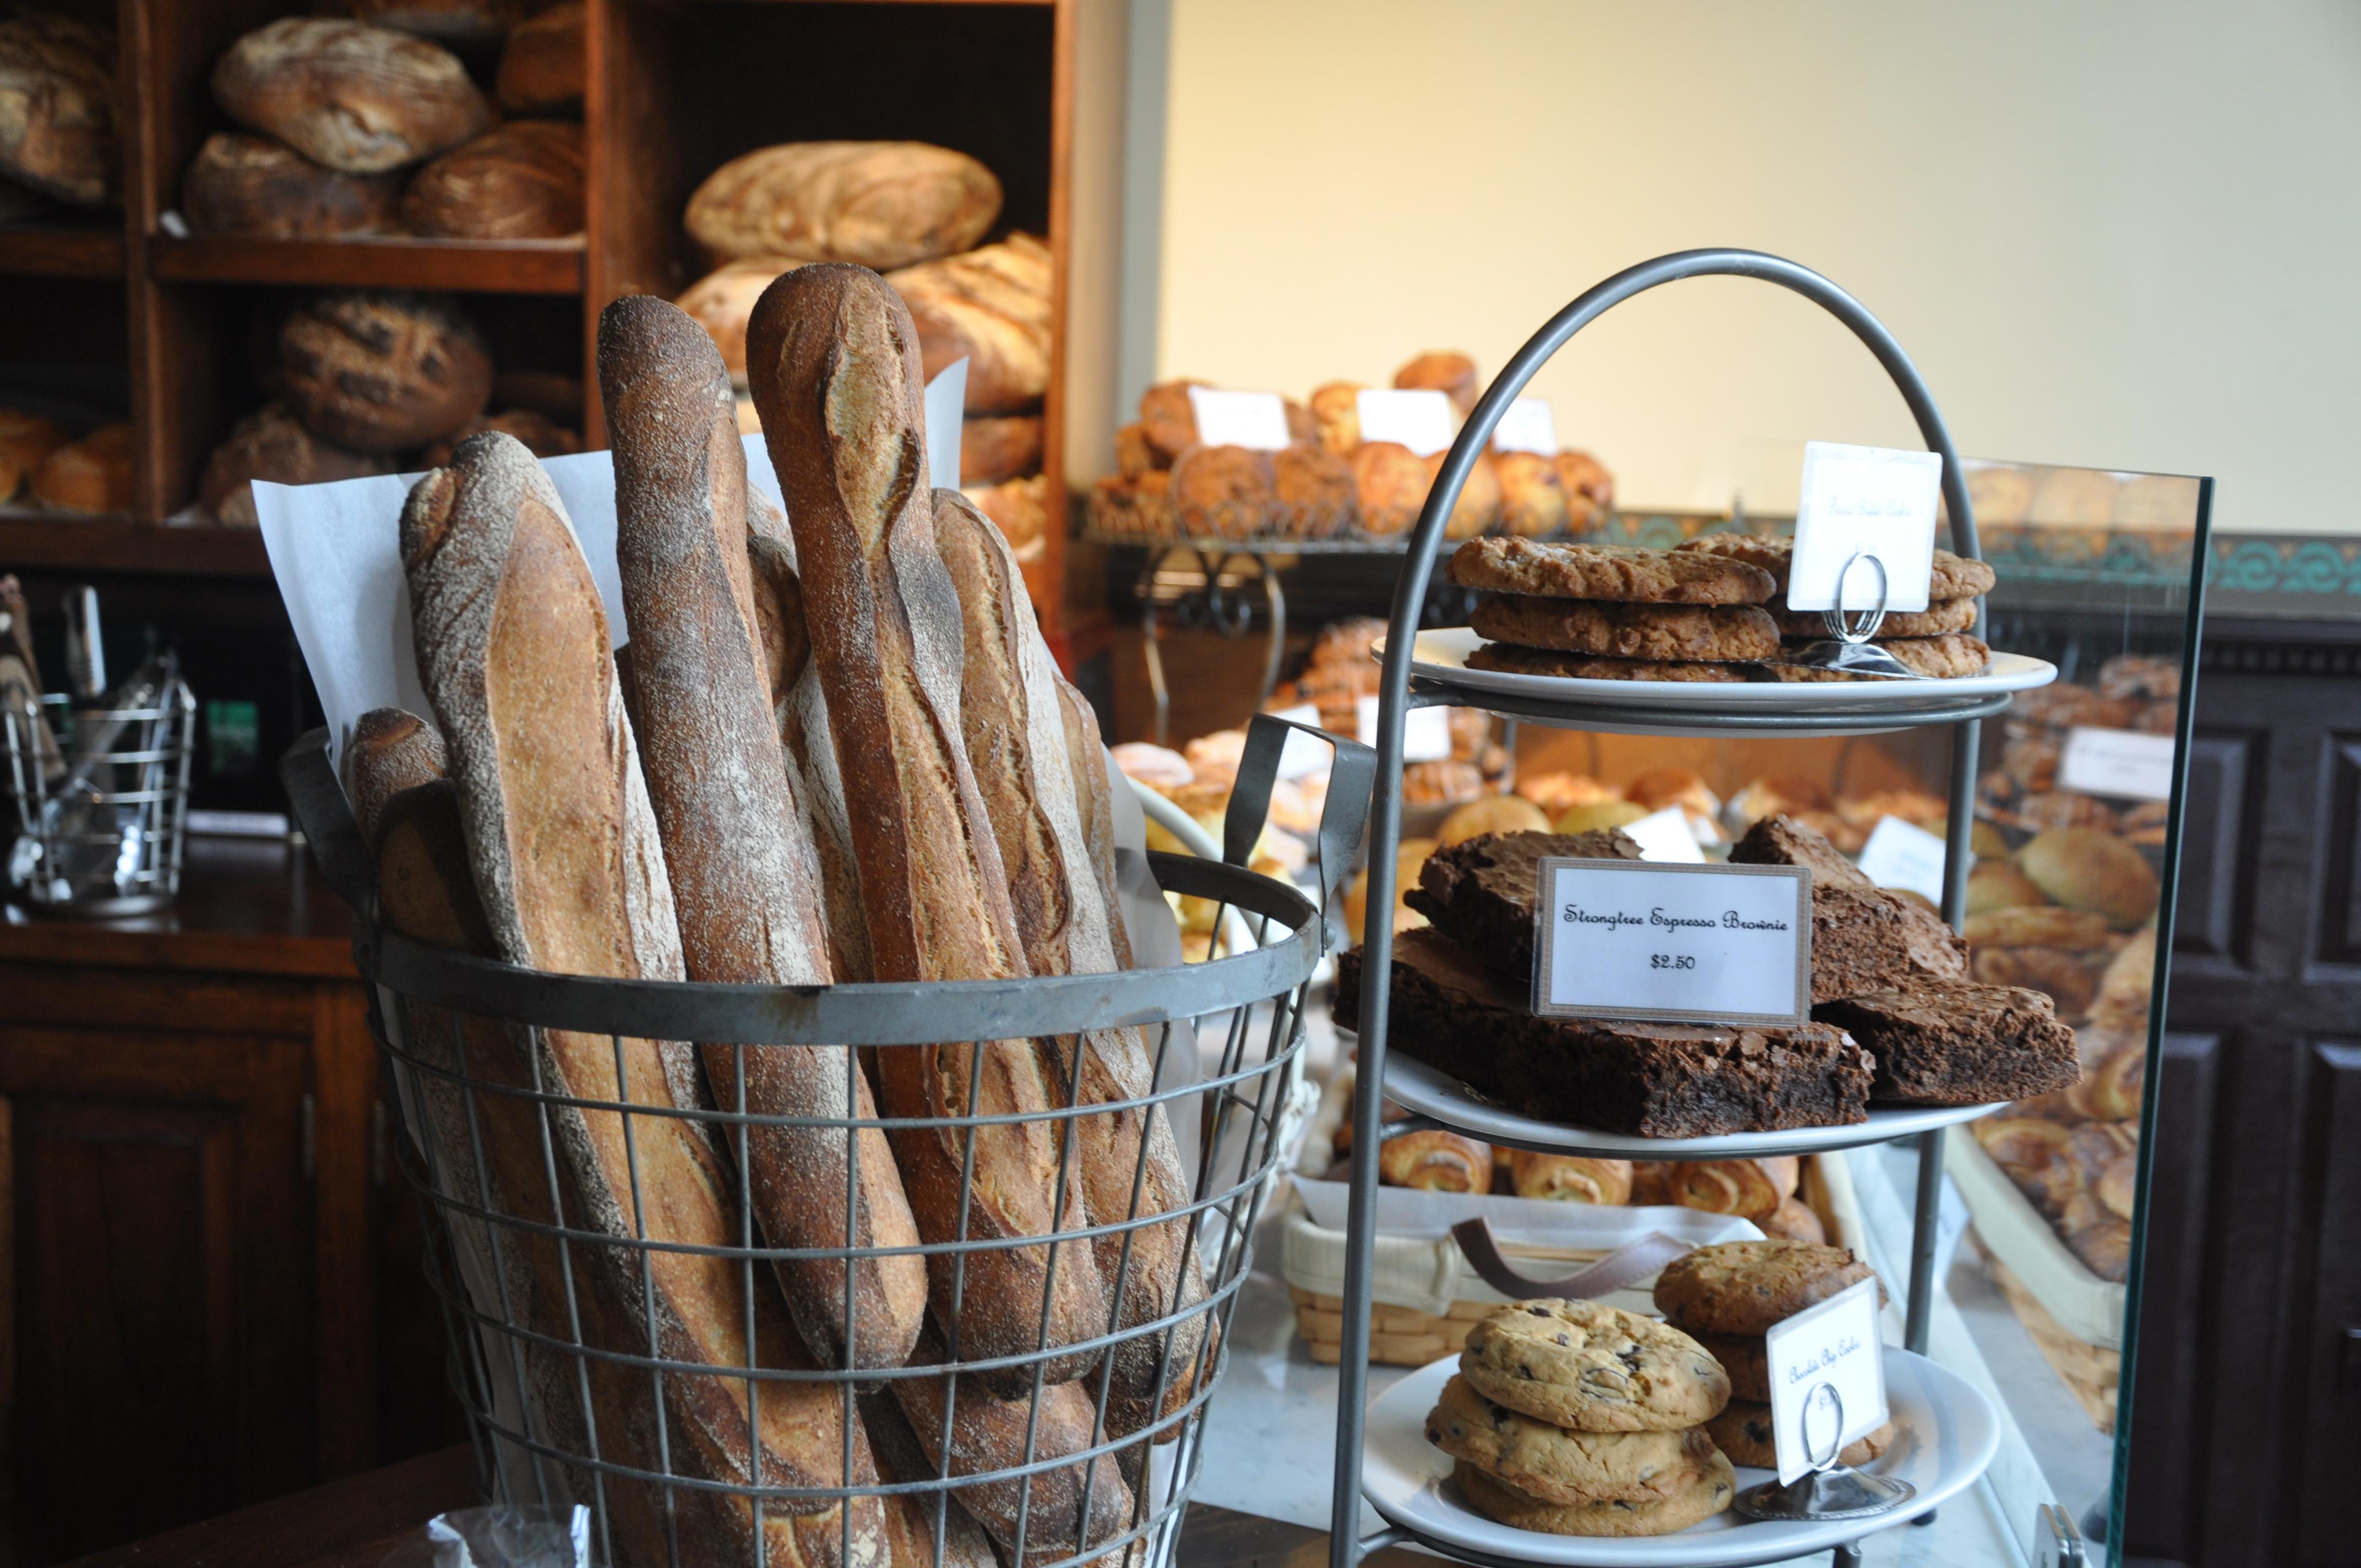 Cafe Le Perche Bakery